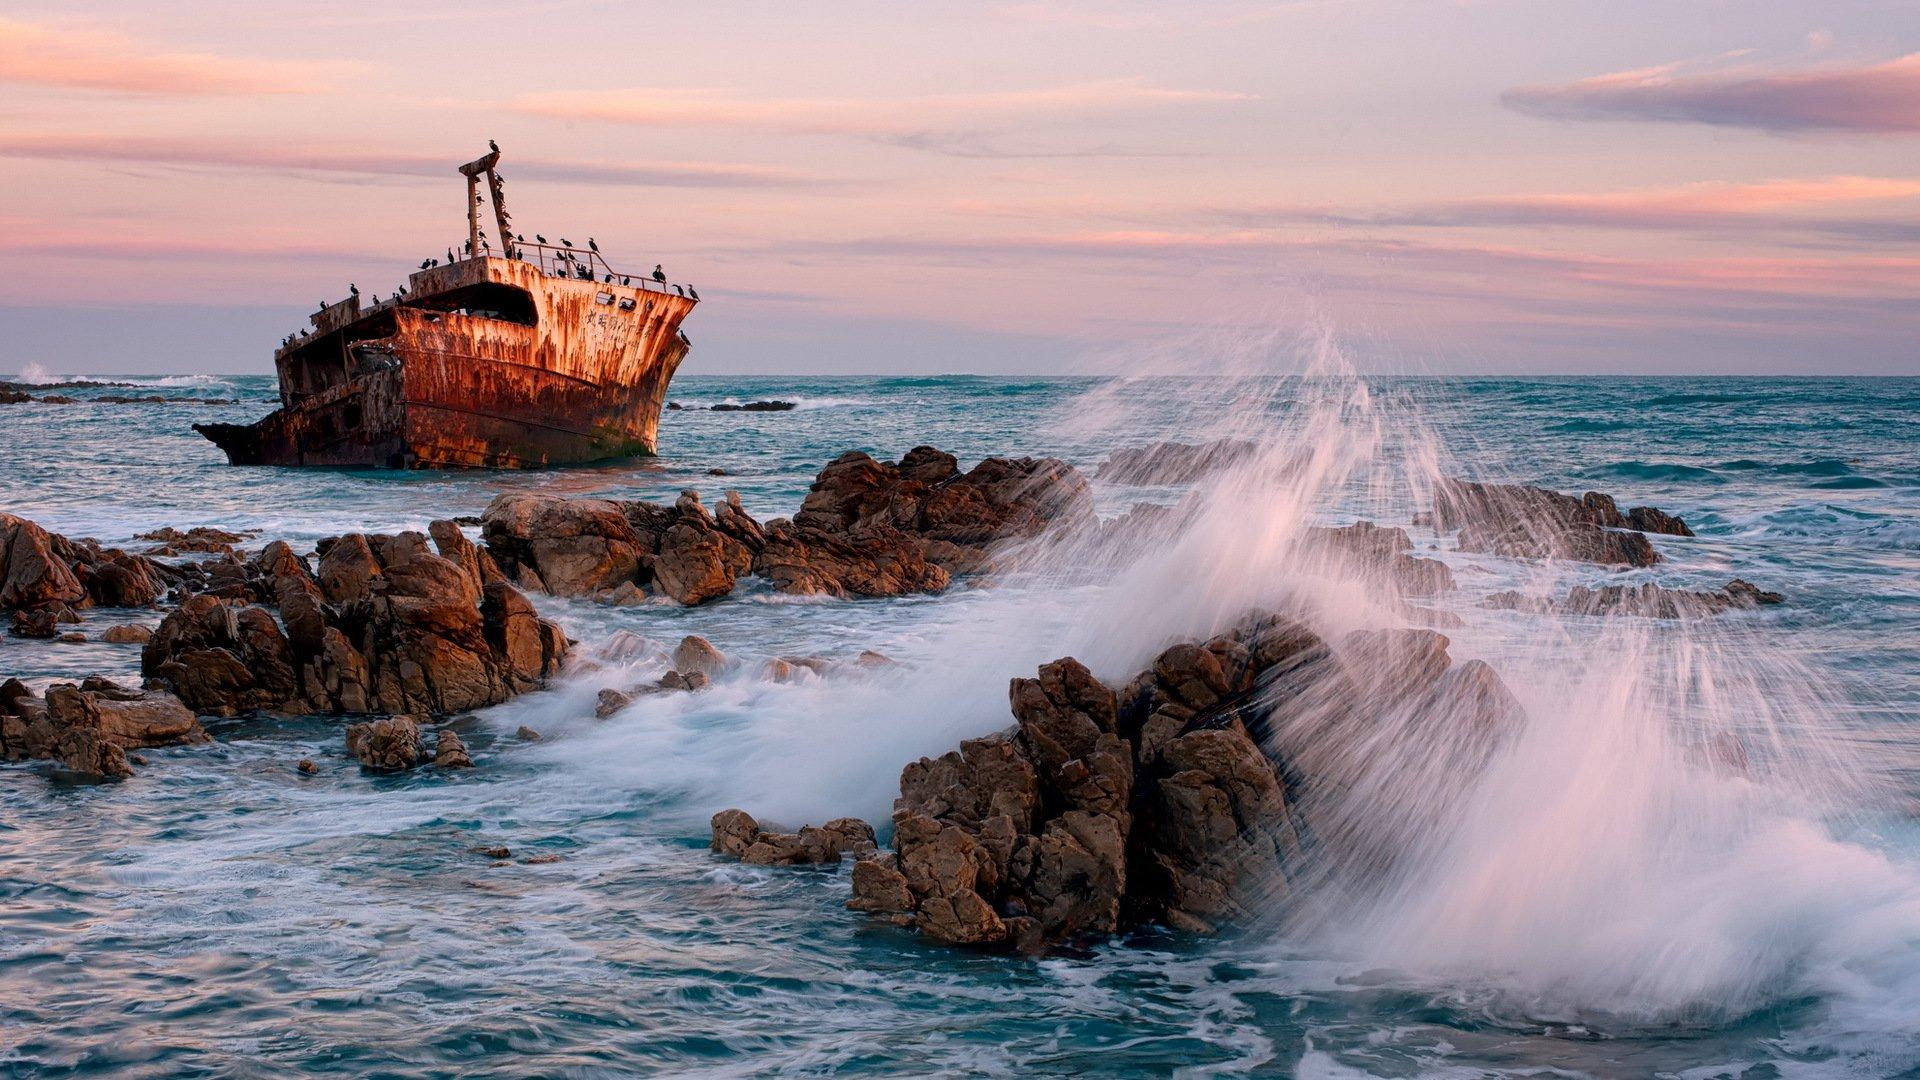 каждым картинка корабль море скалы этого